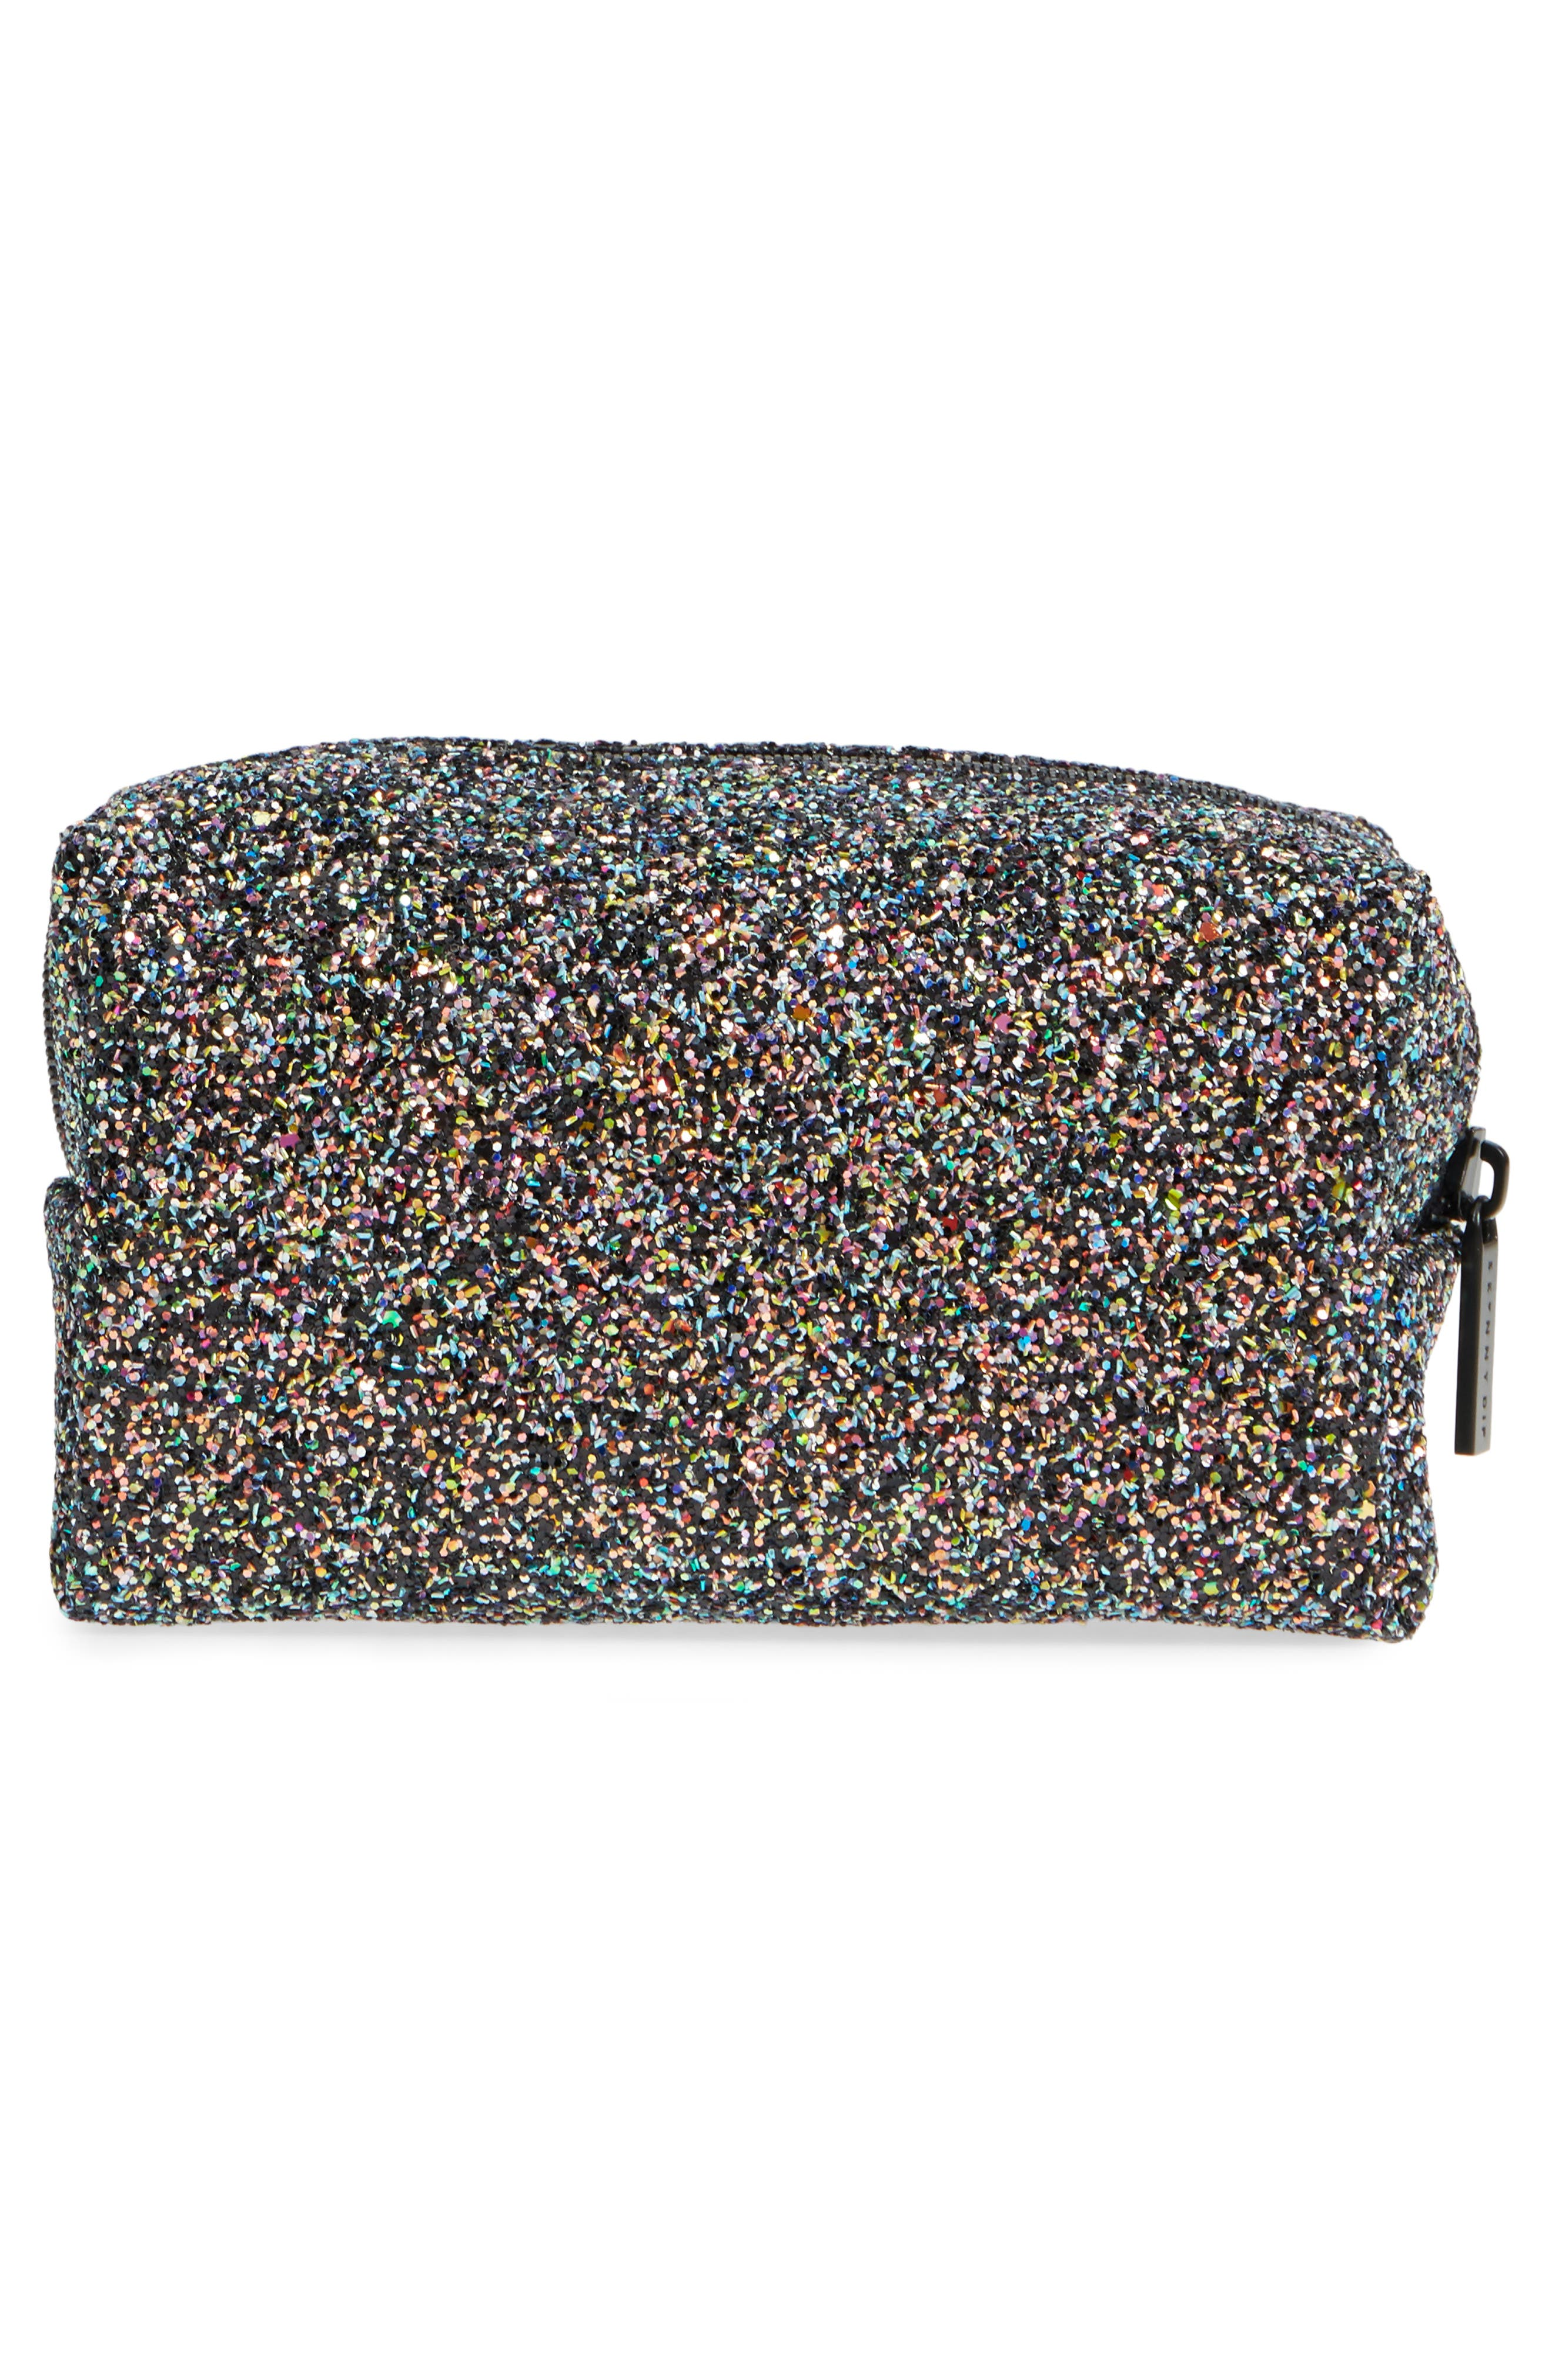 Skinny Dip Liquorice Glitter Cosmetics Bag,                             Alternate thumbnail 2, color,                             000